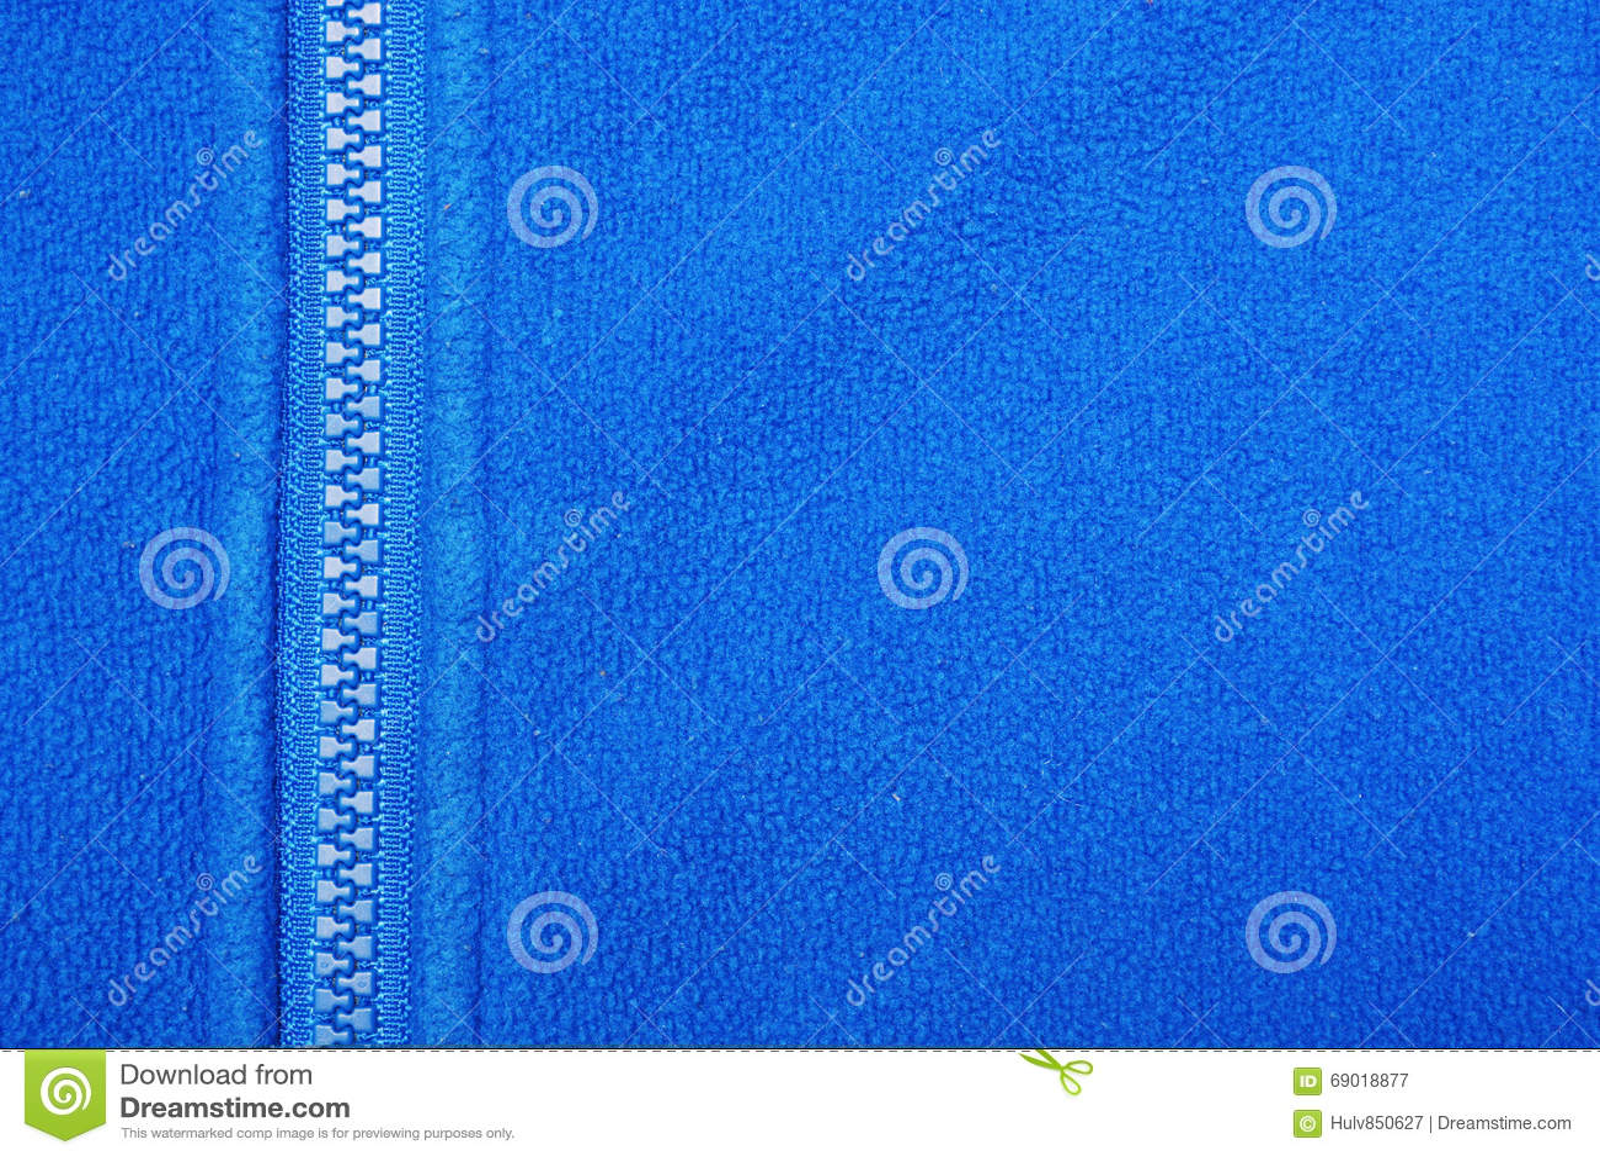 Blauwe vacht